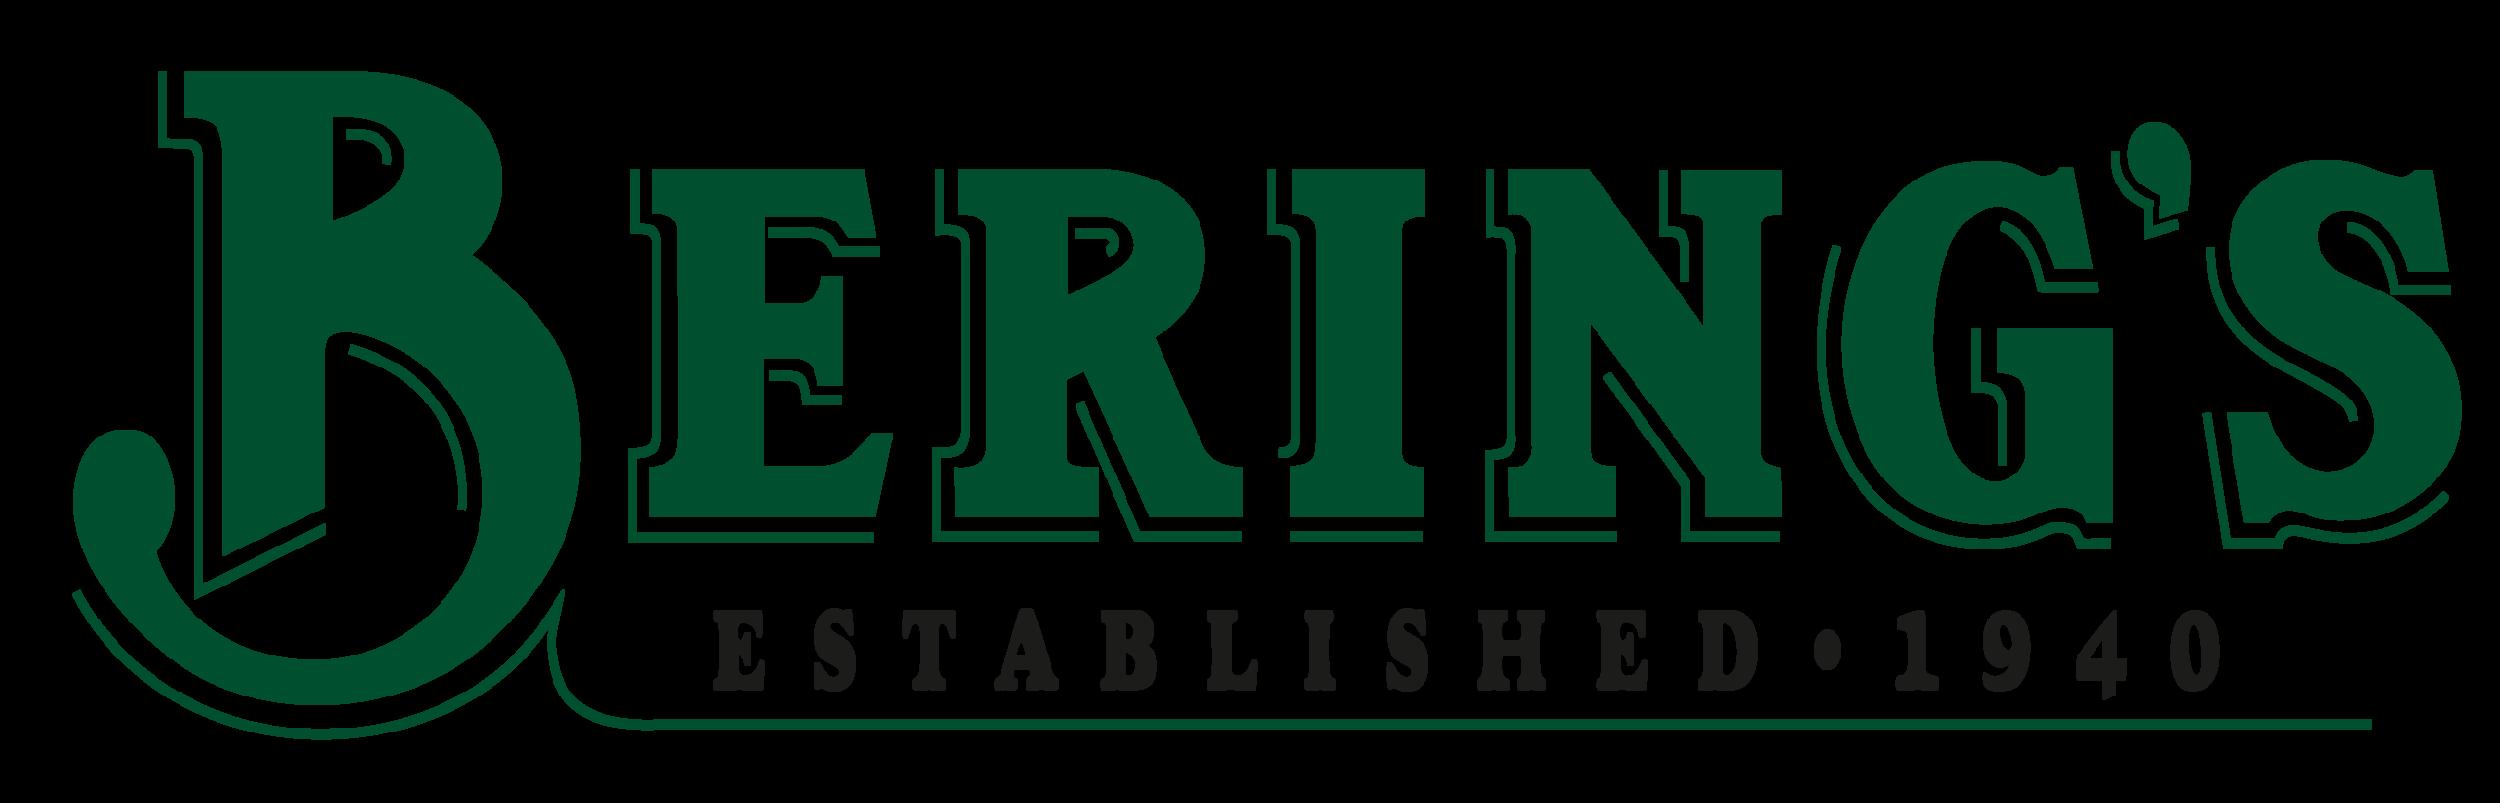 Berings-3435-Classic-Green-and-Black-Logo.png